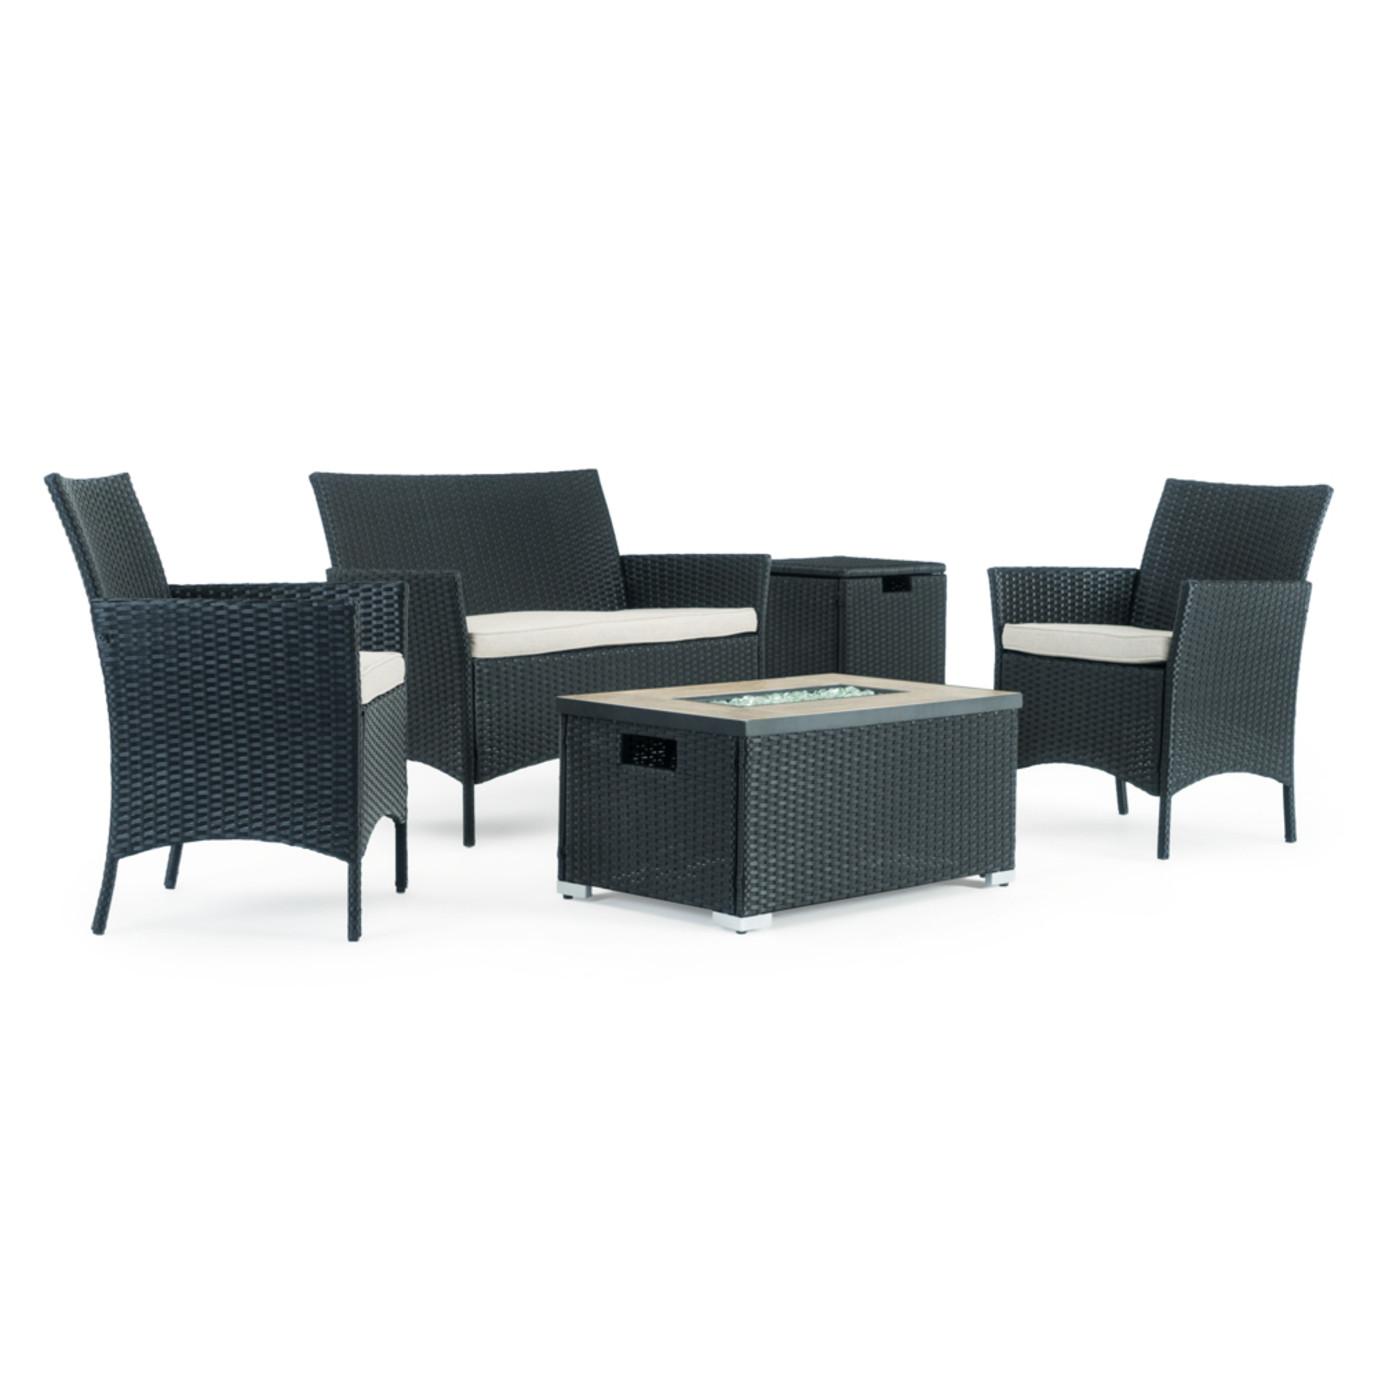 Sego Lily™ Kanab 4 Piece Fire Seating Set